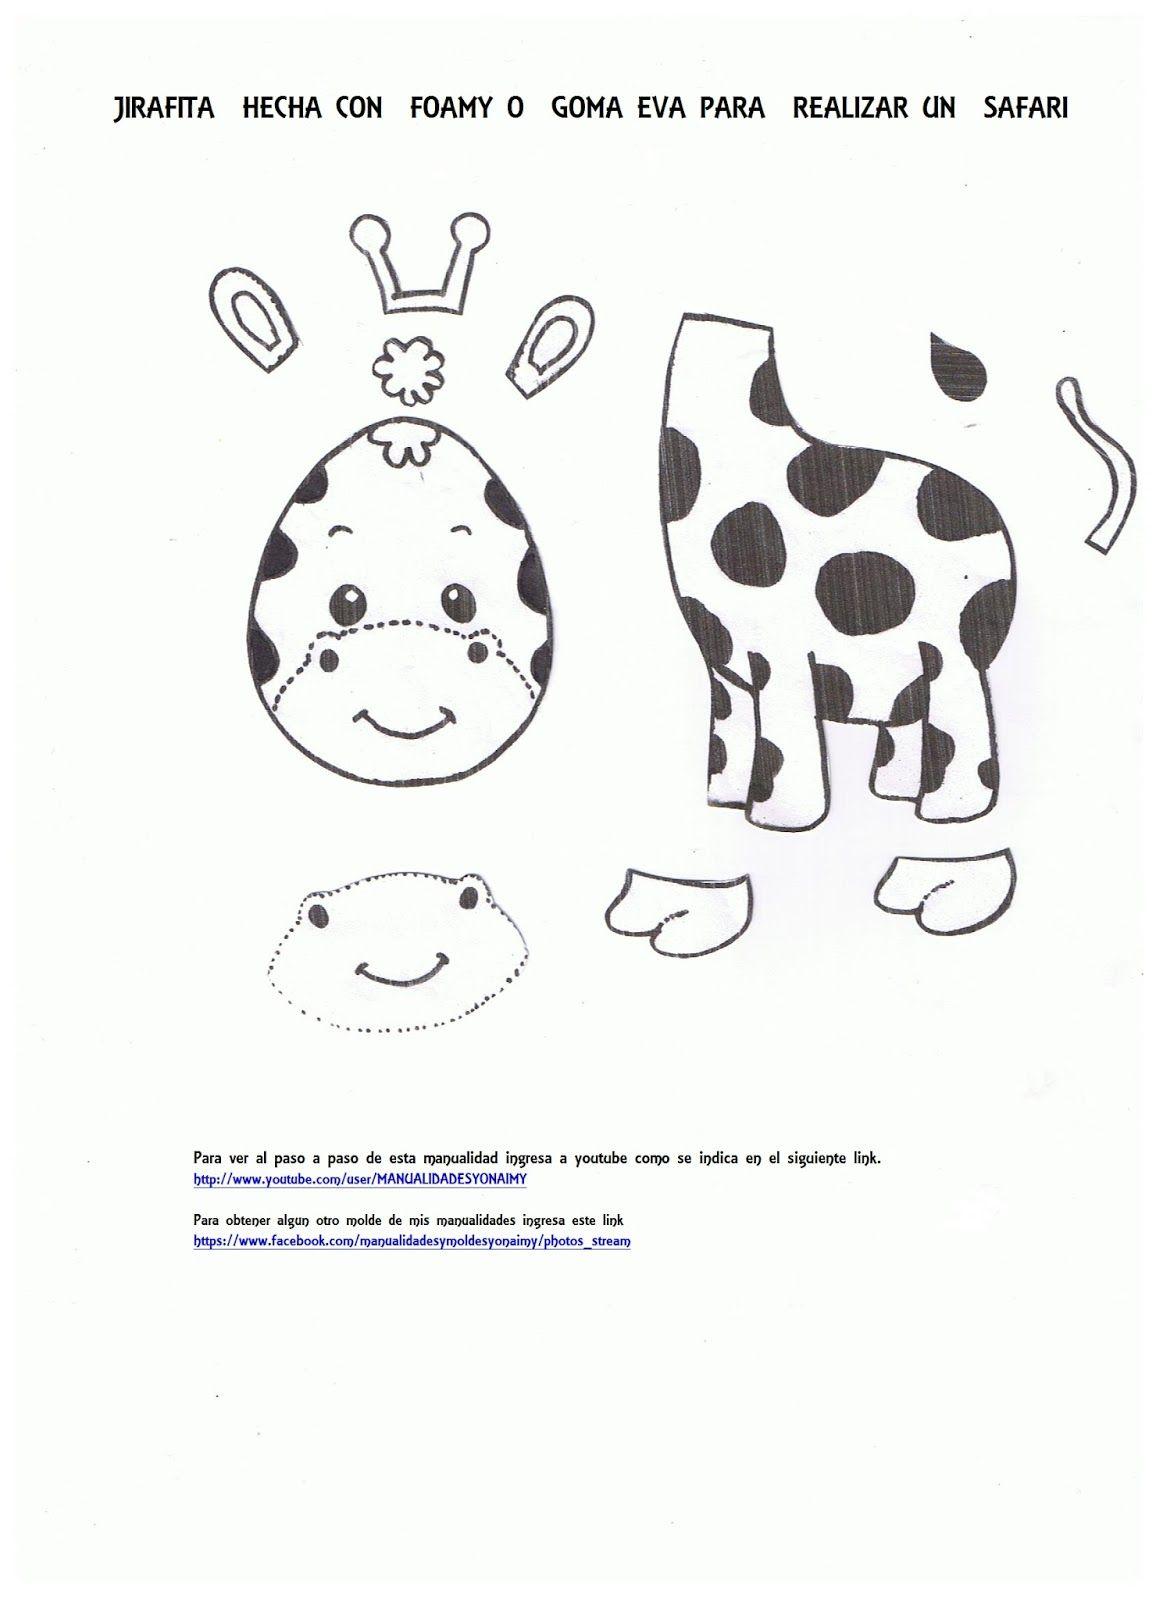 MANUALIDADES YONAIMY | Manualidades yonaimy, Blog de manualidades,  Manualidades